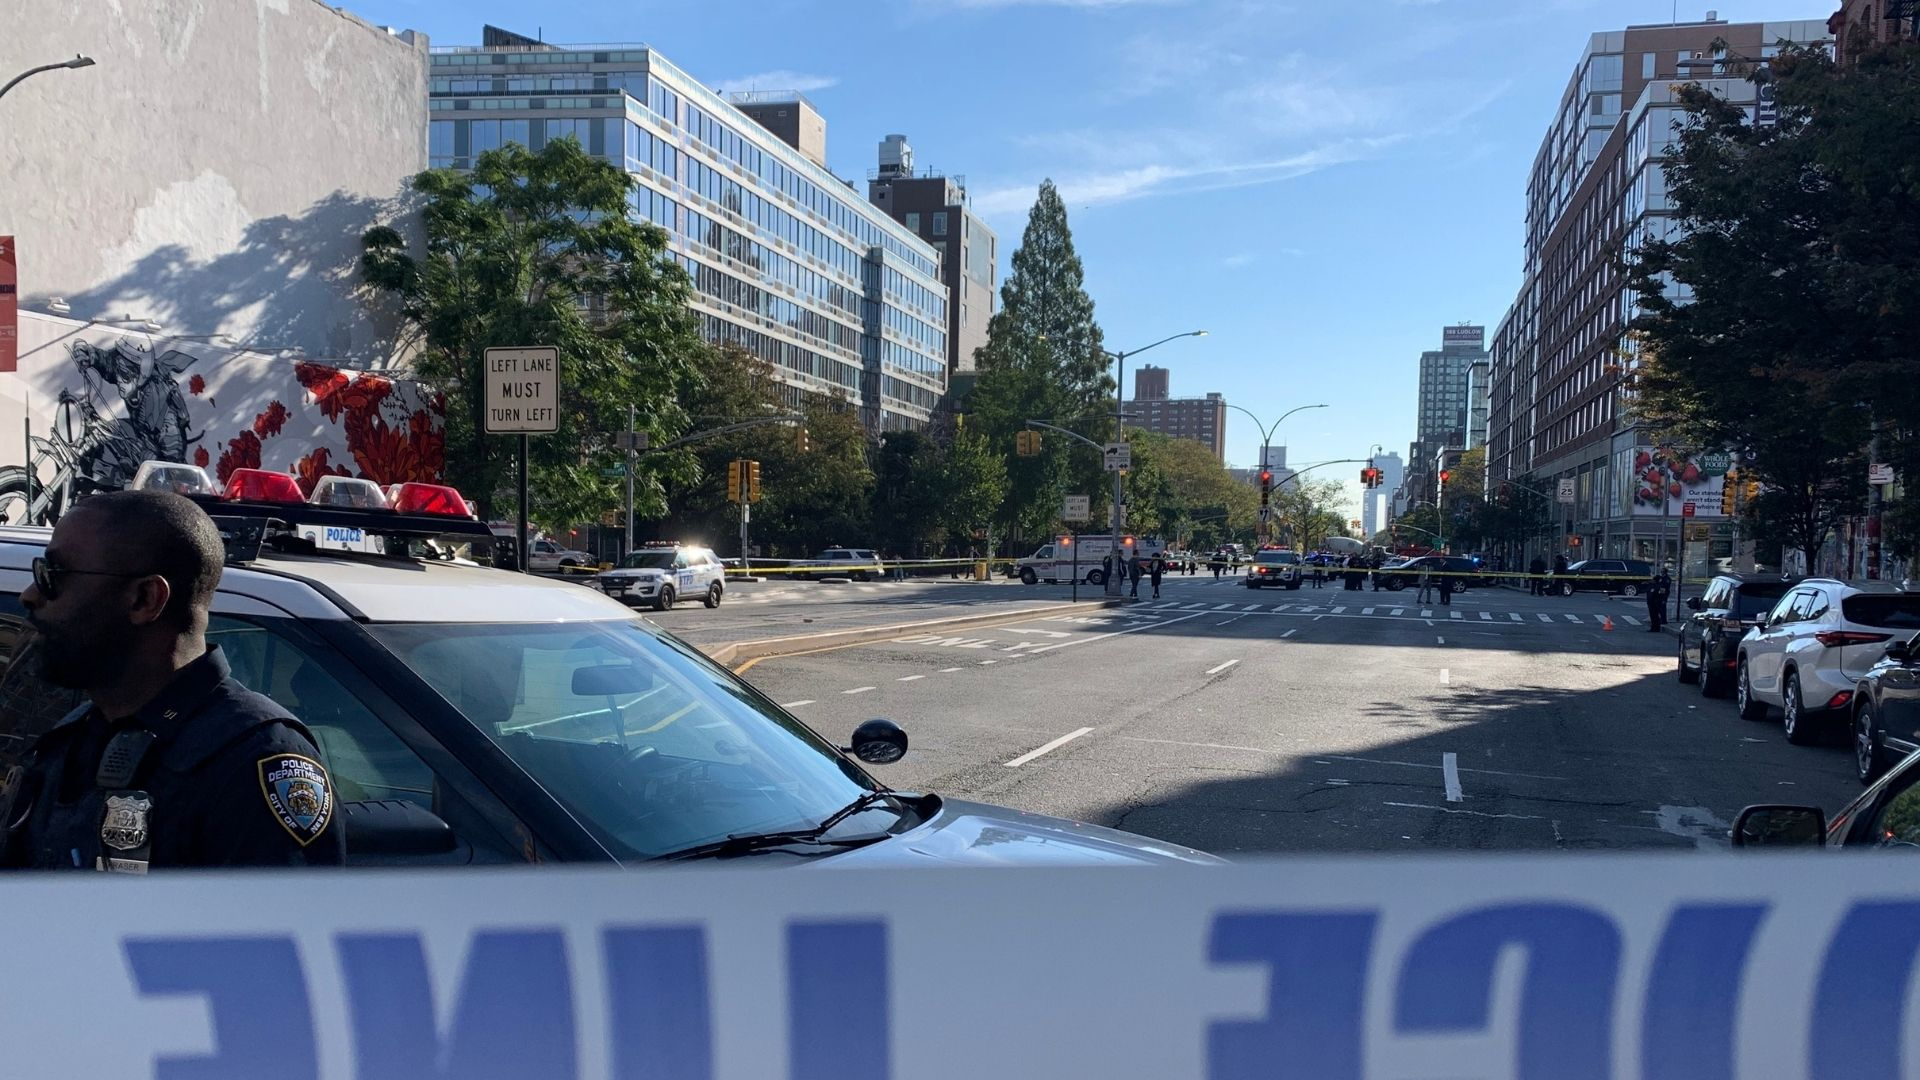 Officer involved shooting in Lower Manhattan